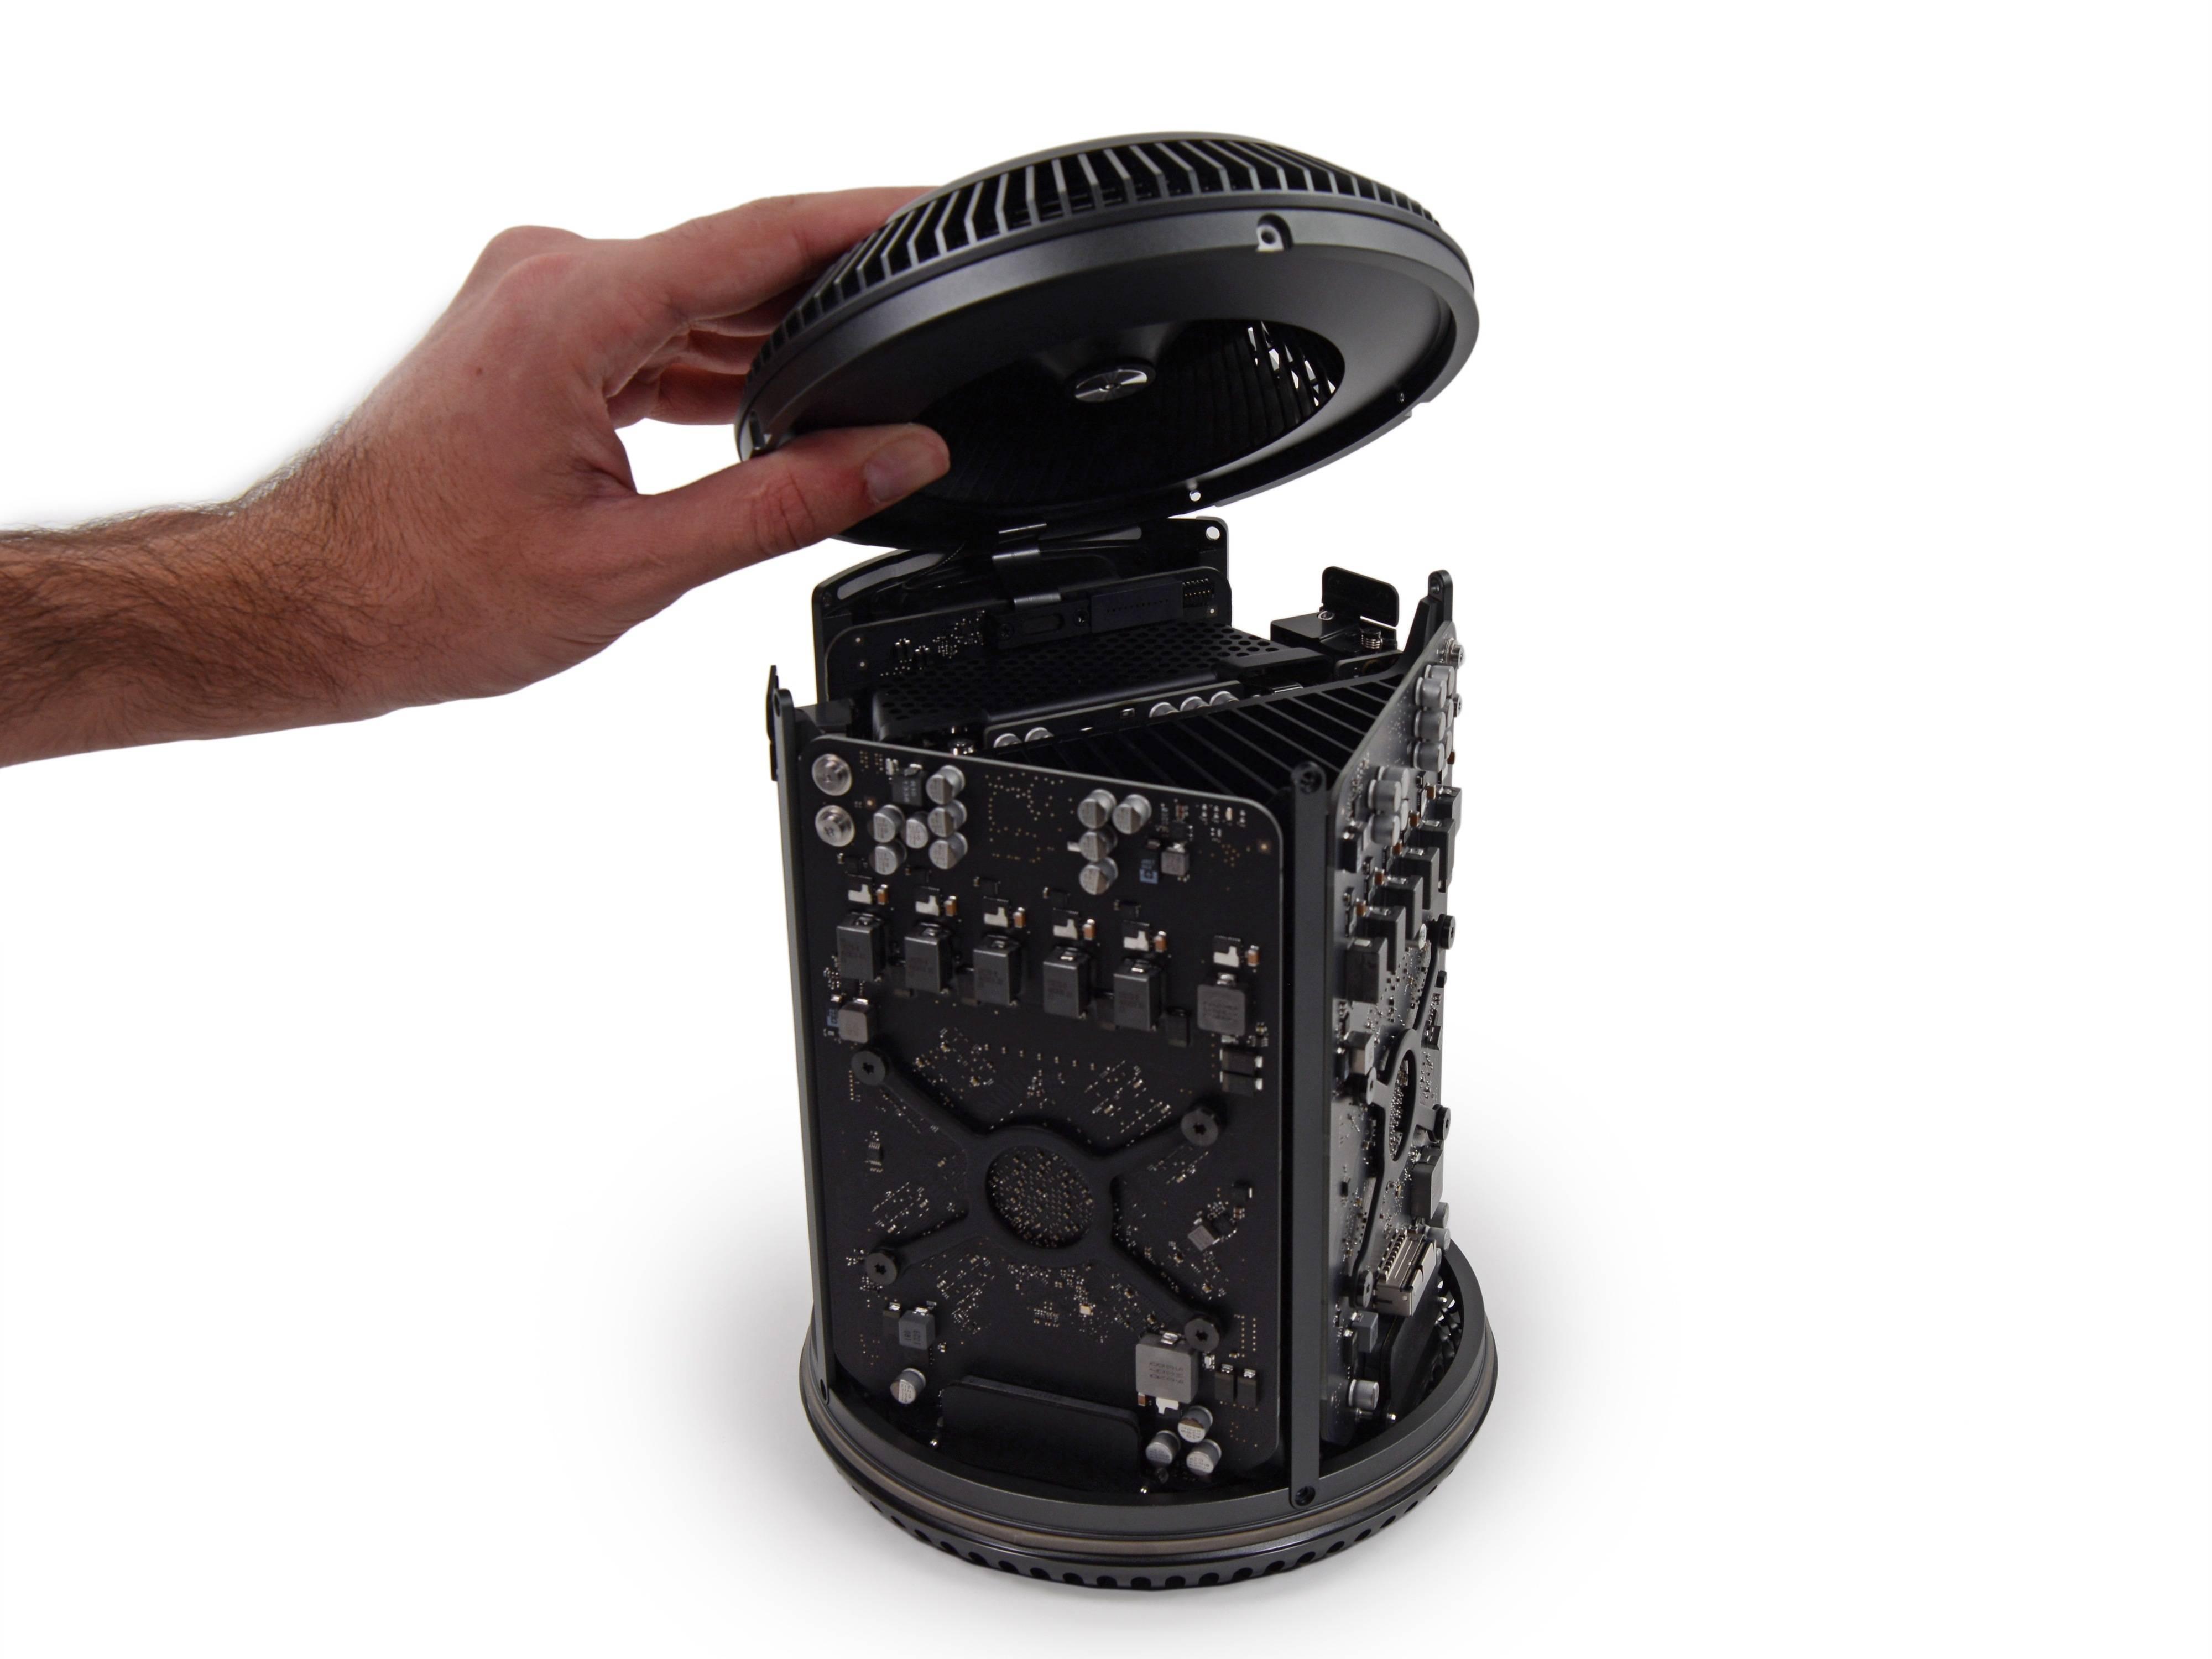 Mac Pro 能用极小机身装下了(在当时)强大的性能配置,得益于独特的内部设计。但这个设计也成了产品线更新的桎梏